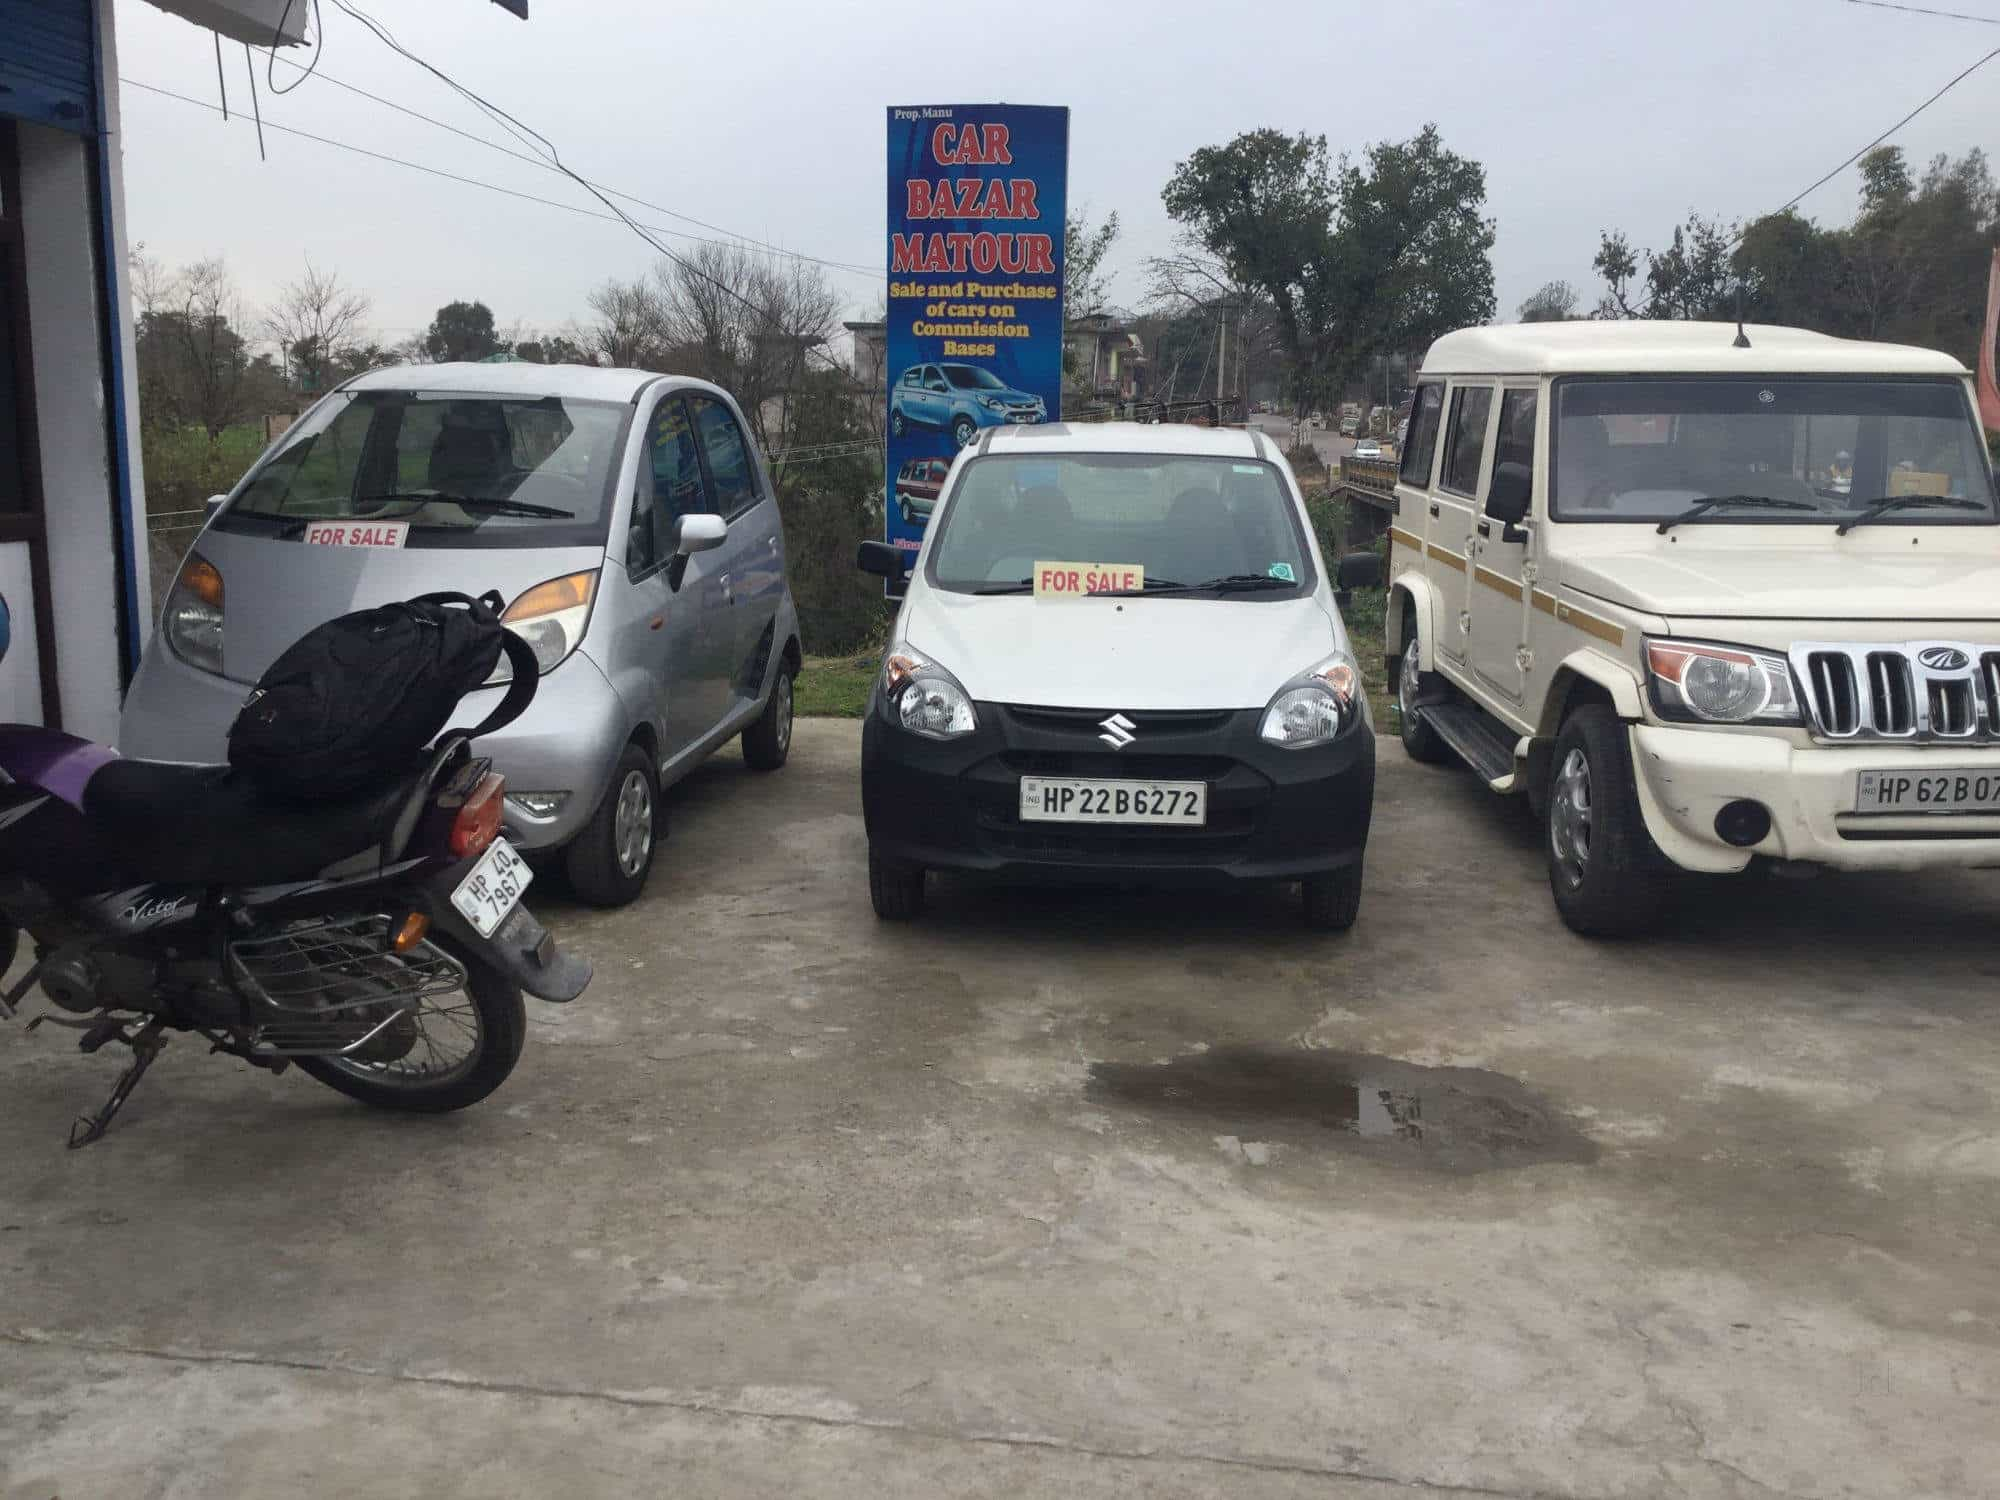 Car Bazar Motour Second Hand Car Dealers in Kangra Justdial